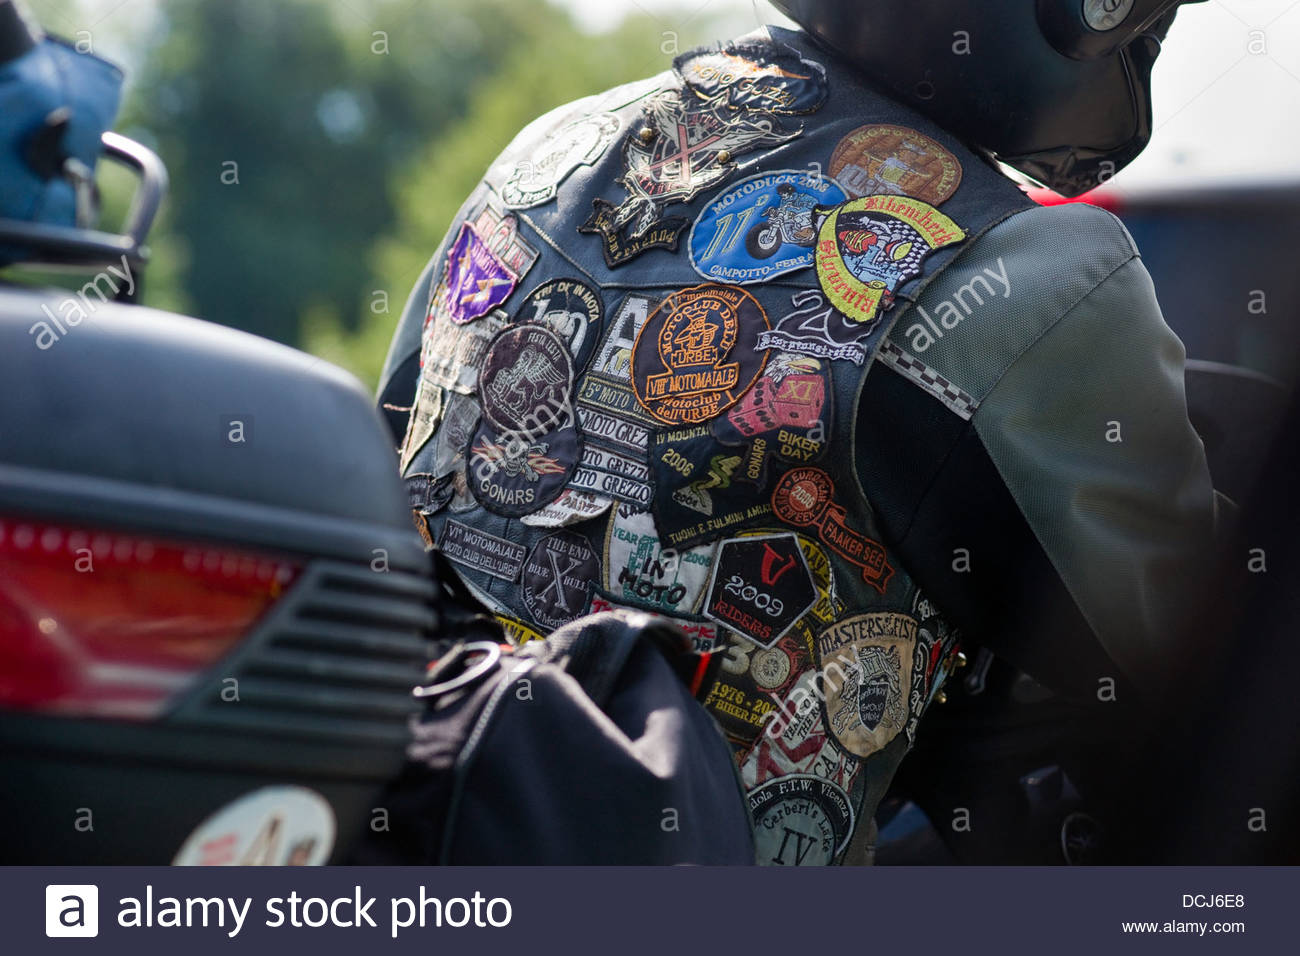 Hombre Imagen Moto Chaqueta Cuero Stock Rider Foto Parches amp; De 5RRwnq6g